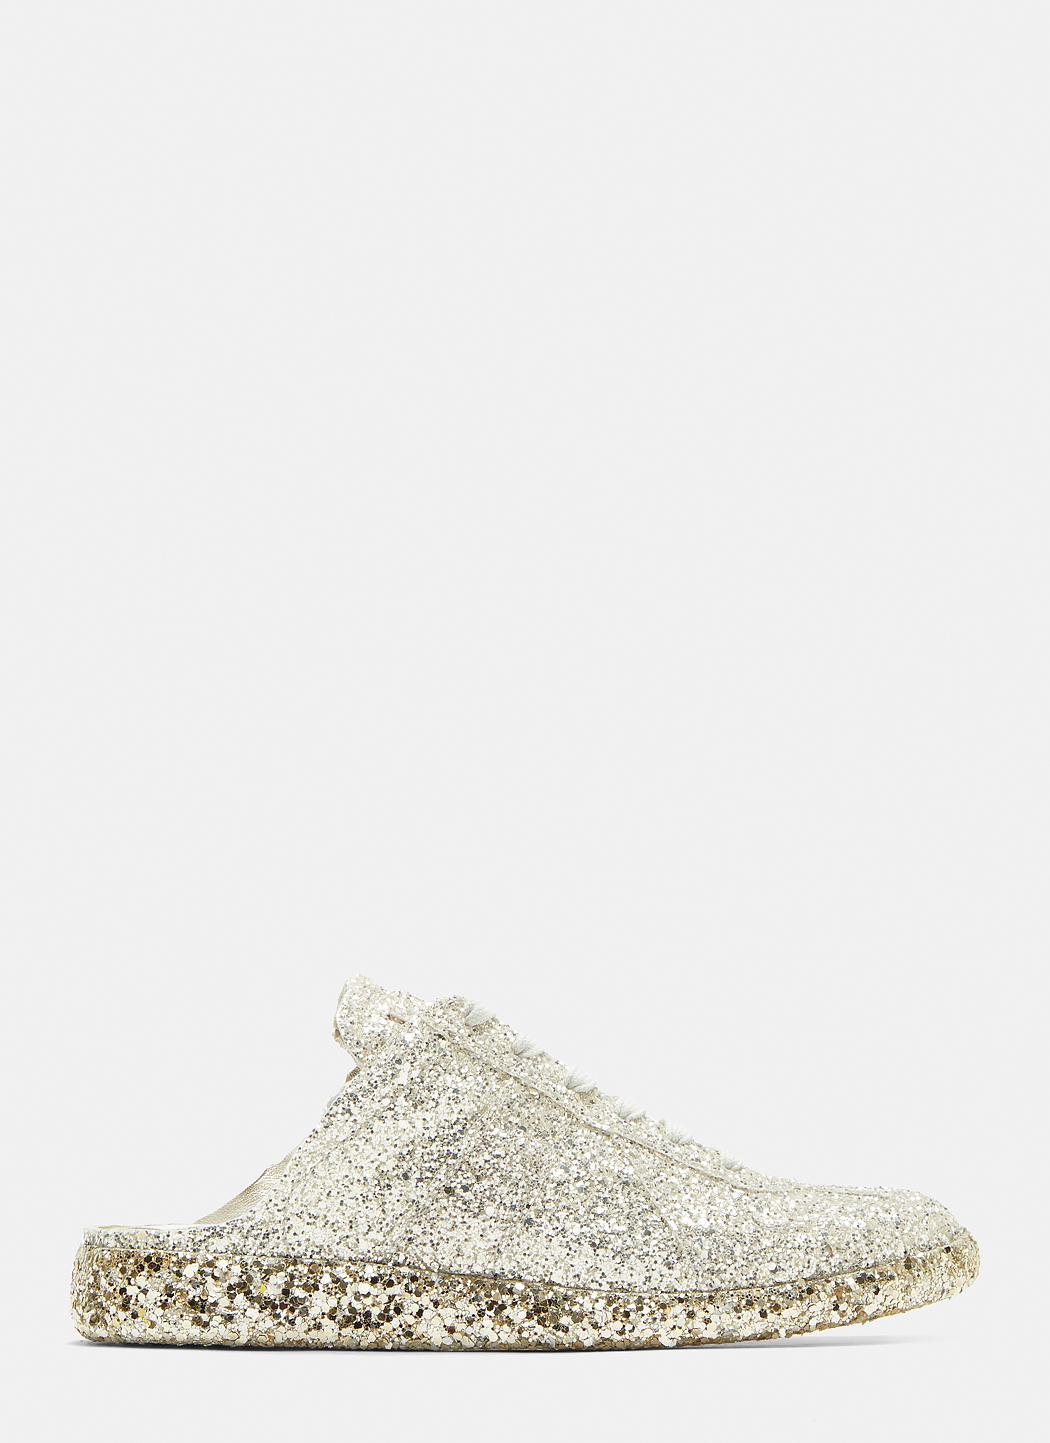 Maison Margiela Glitter Cut-Out Replica Sneakers oSwwXAa8